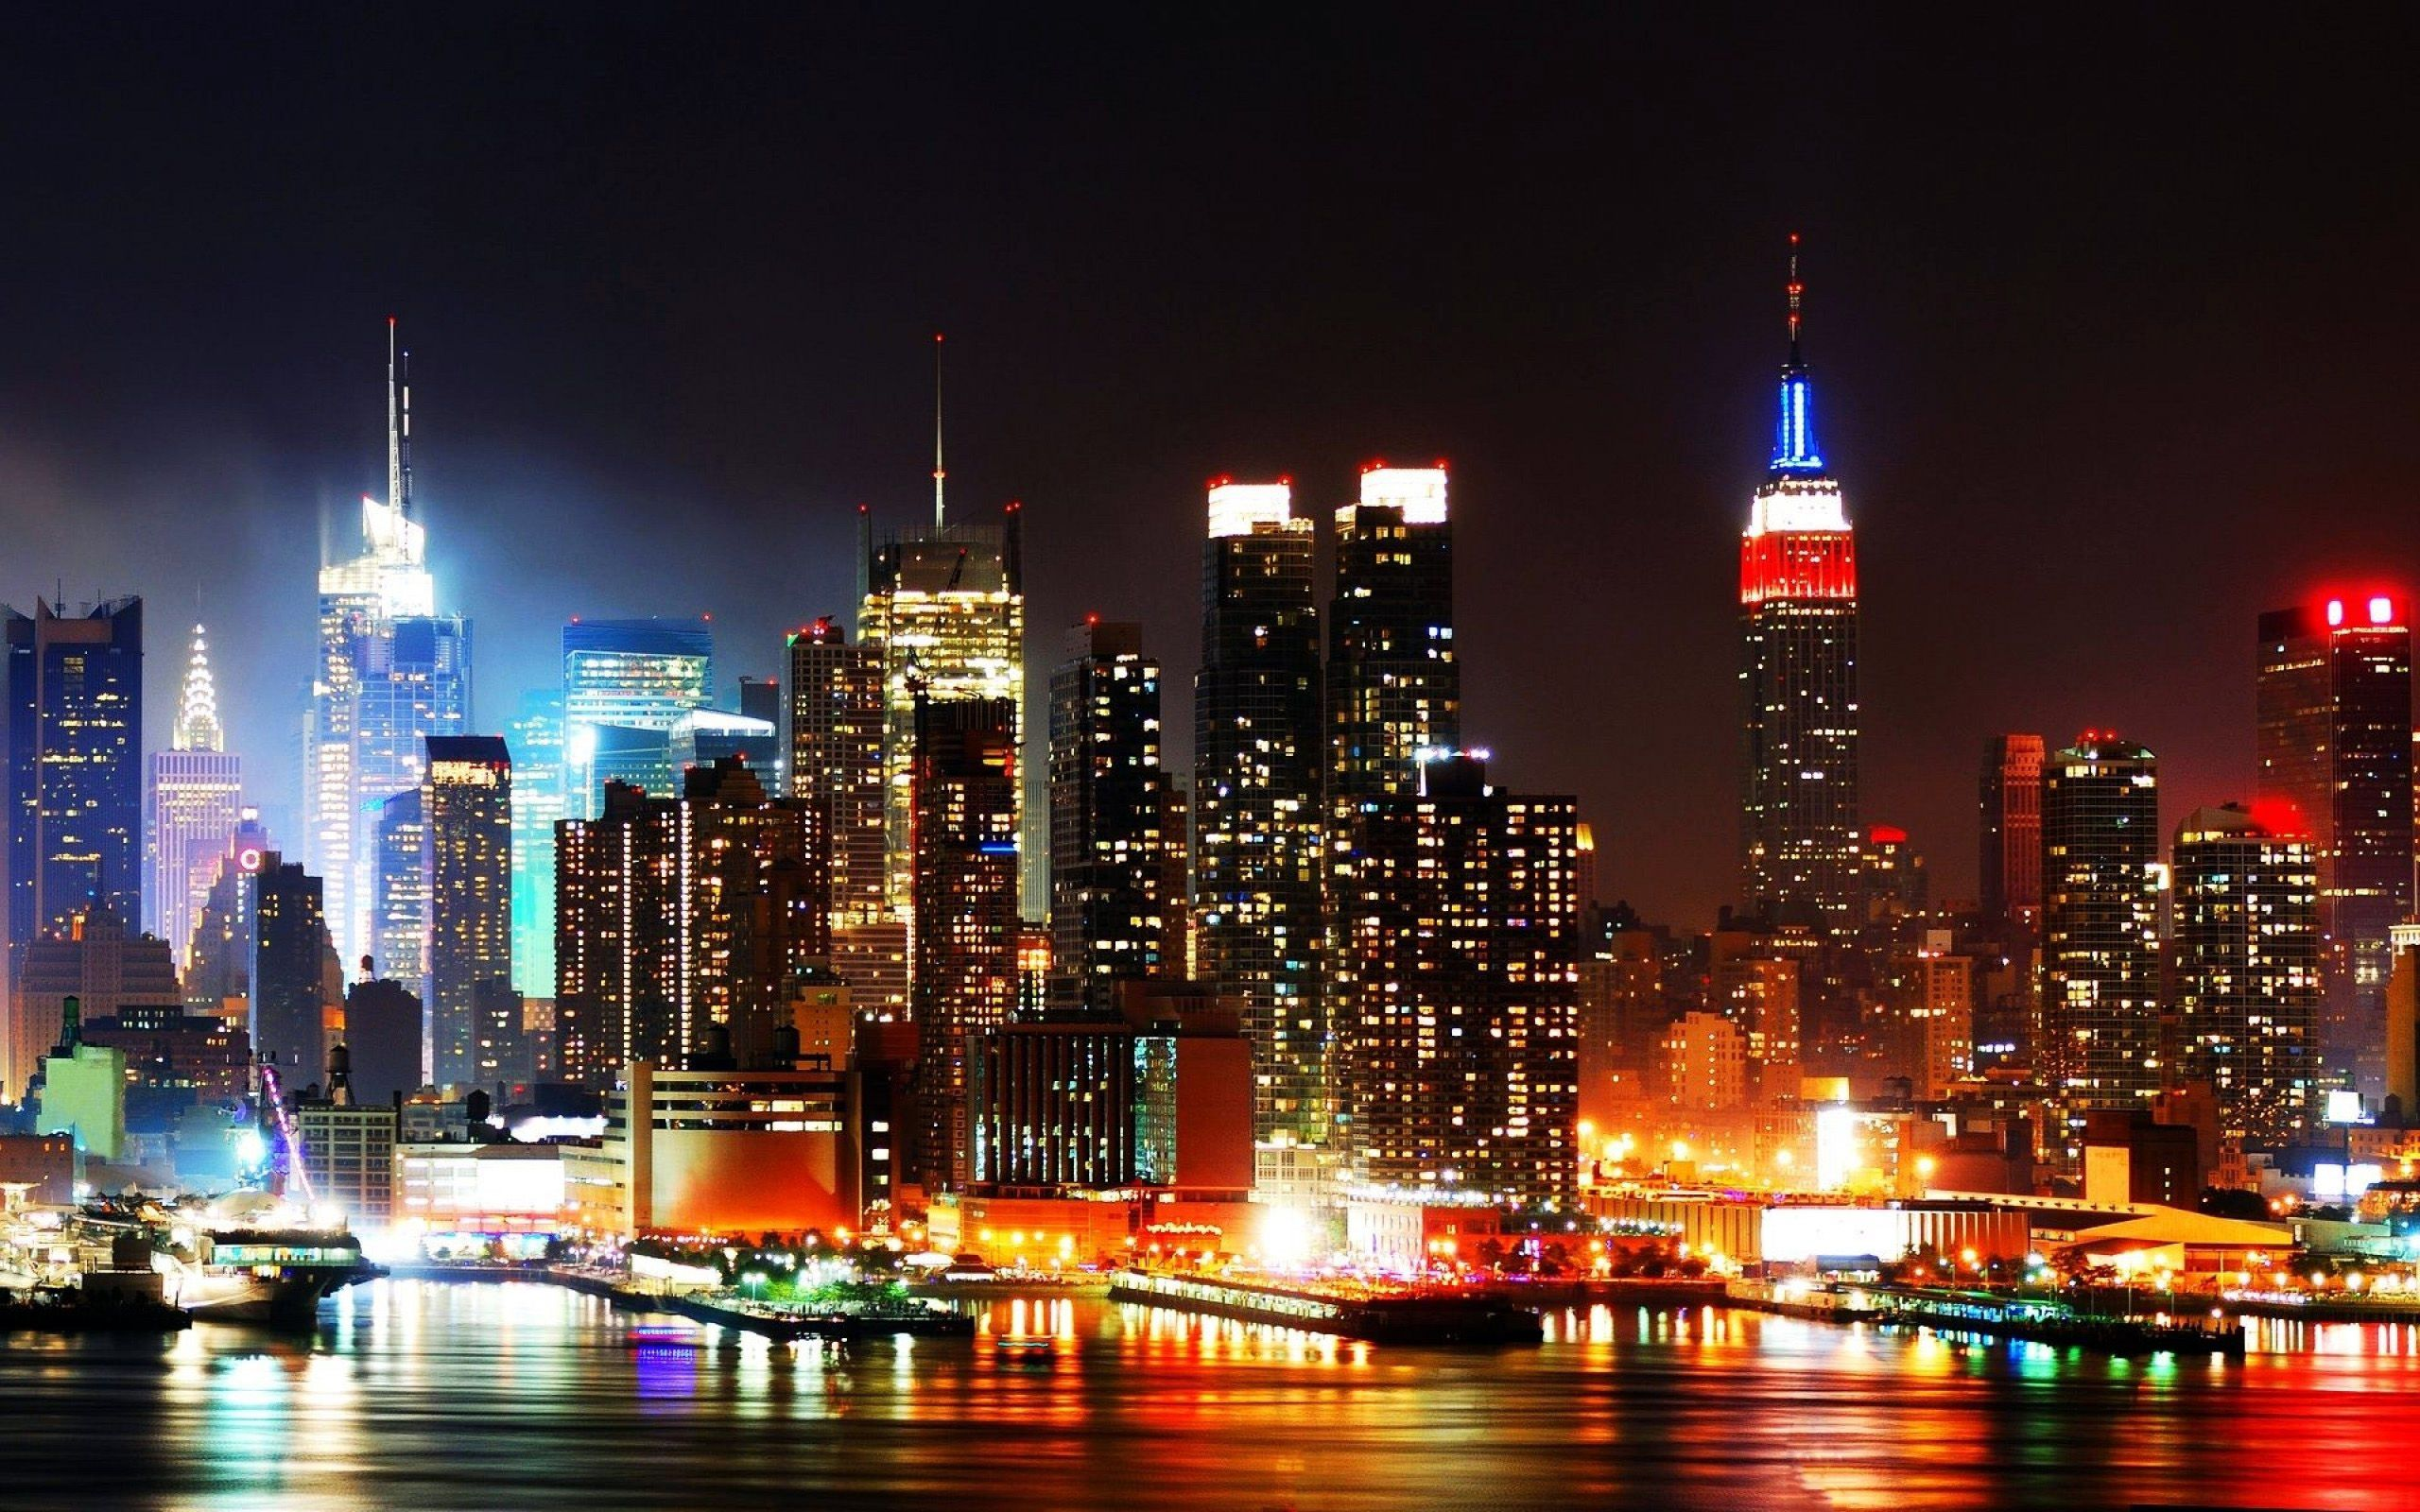 Wallpaper New York City USA Megapolis night time Cities Houses